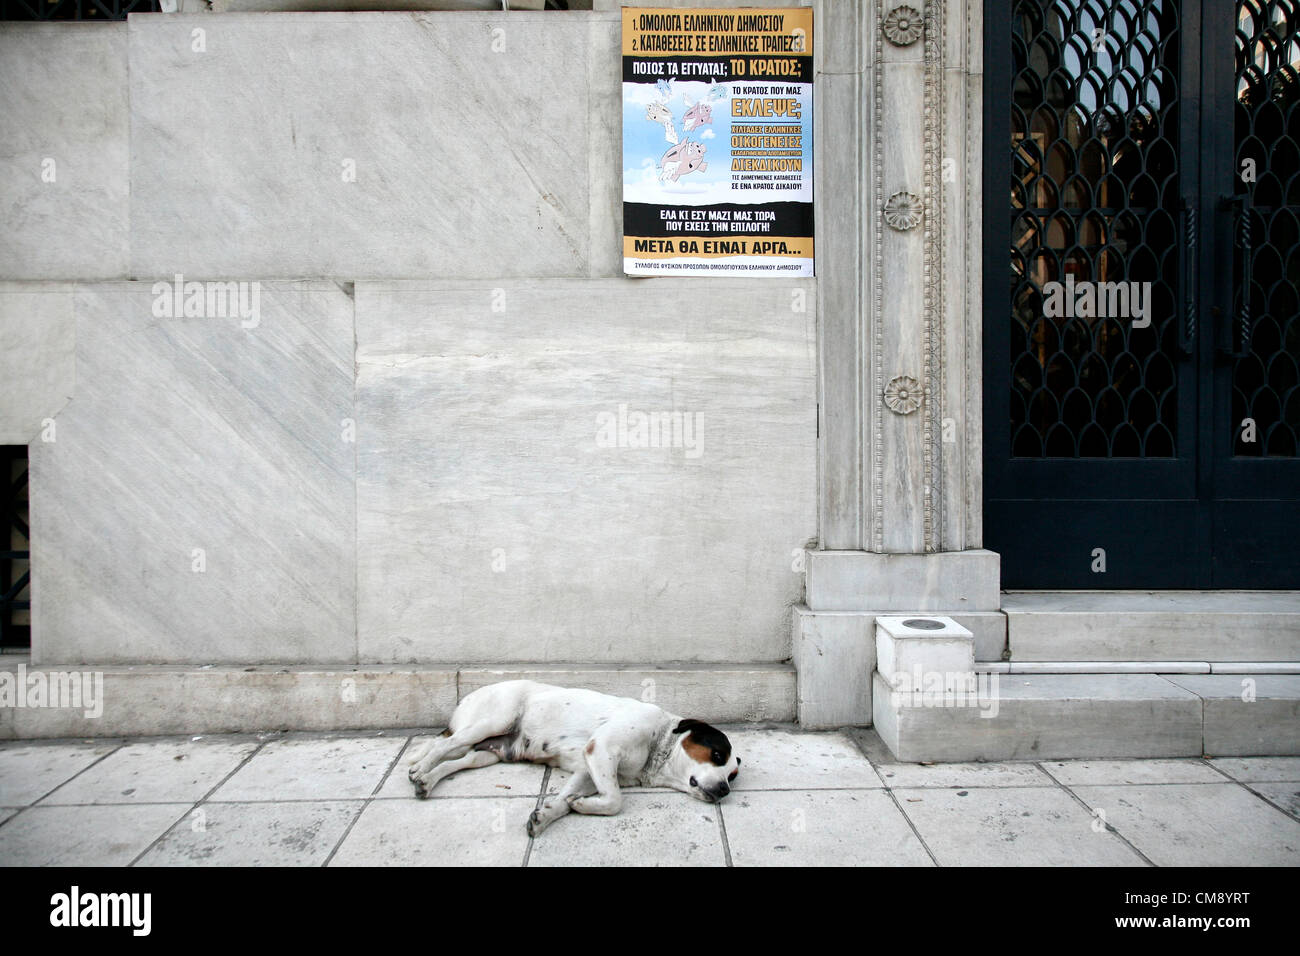 Thessaloniki, Greece. October 31, 2012. A dog sleep outside of the Bank of Greece department. Greek bondholders - Stock Image